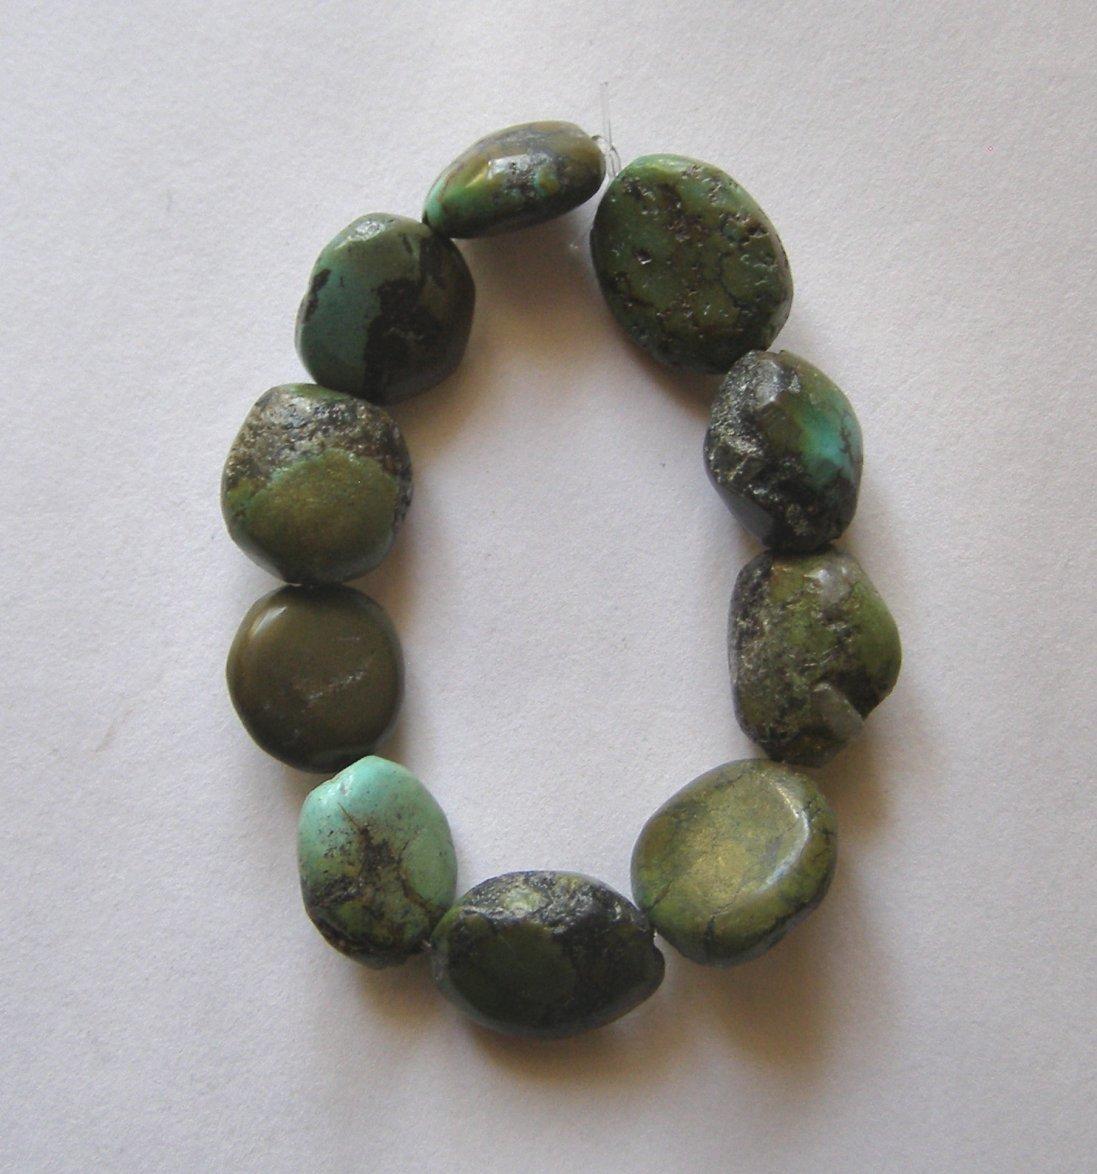 10 Native Turquoise 15x13 Pebble Beads